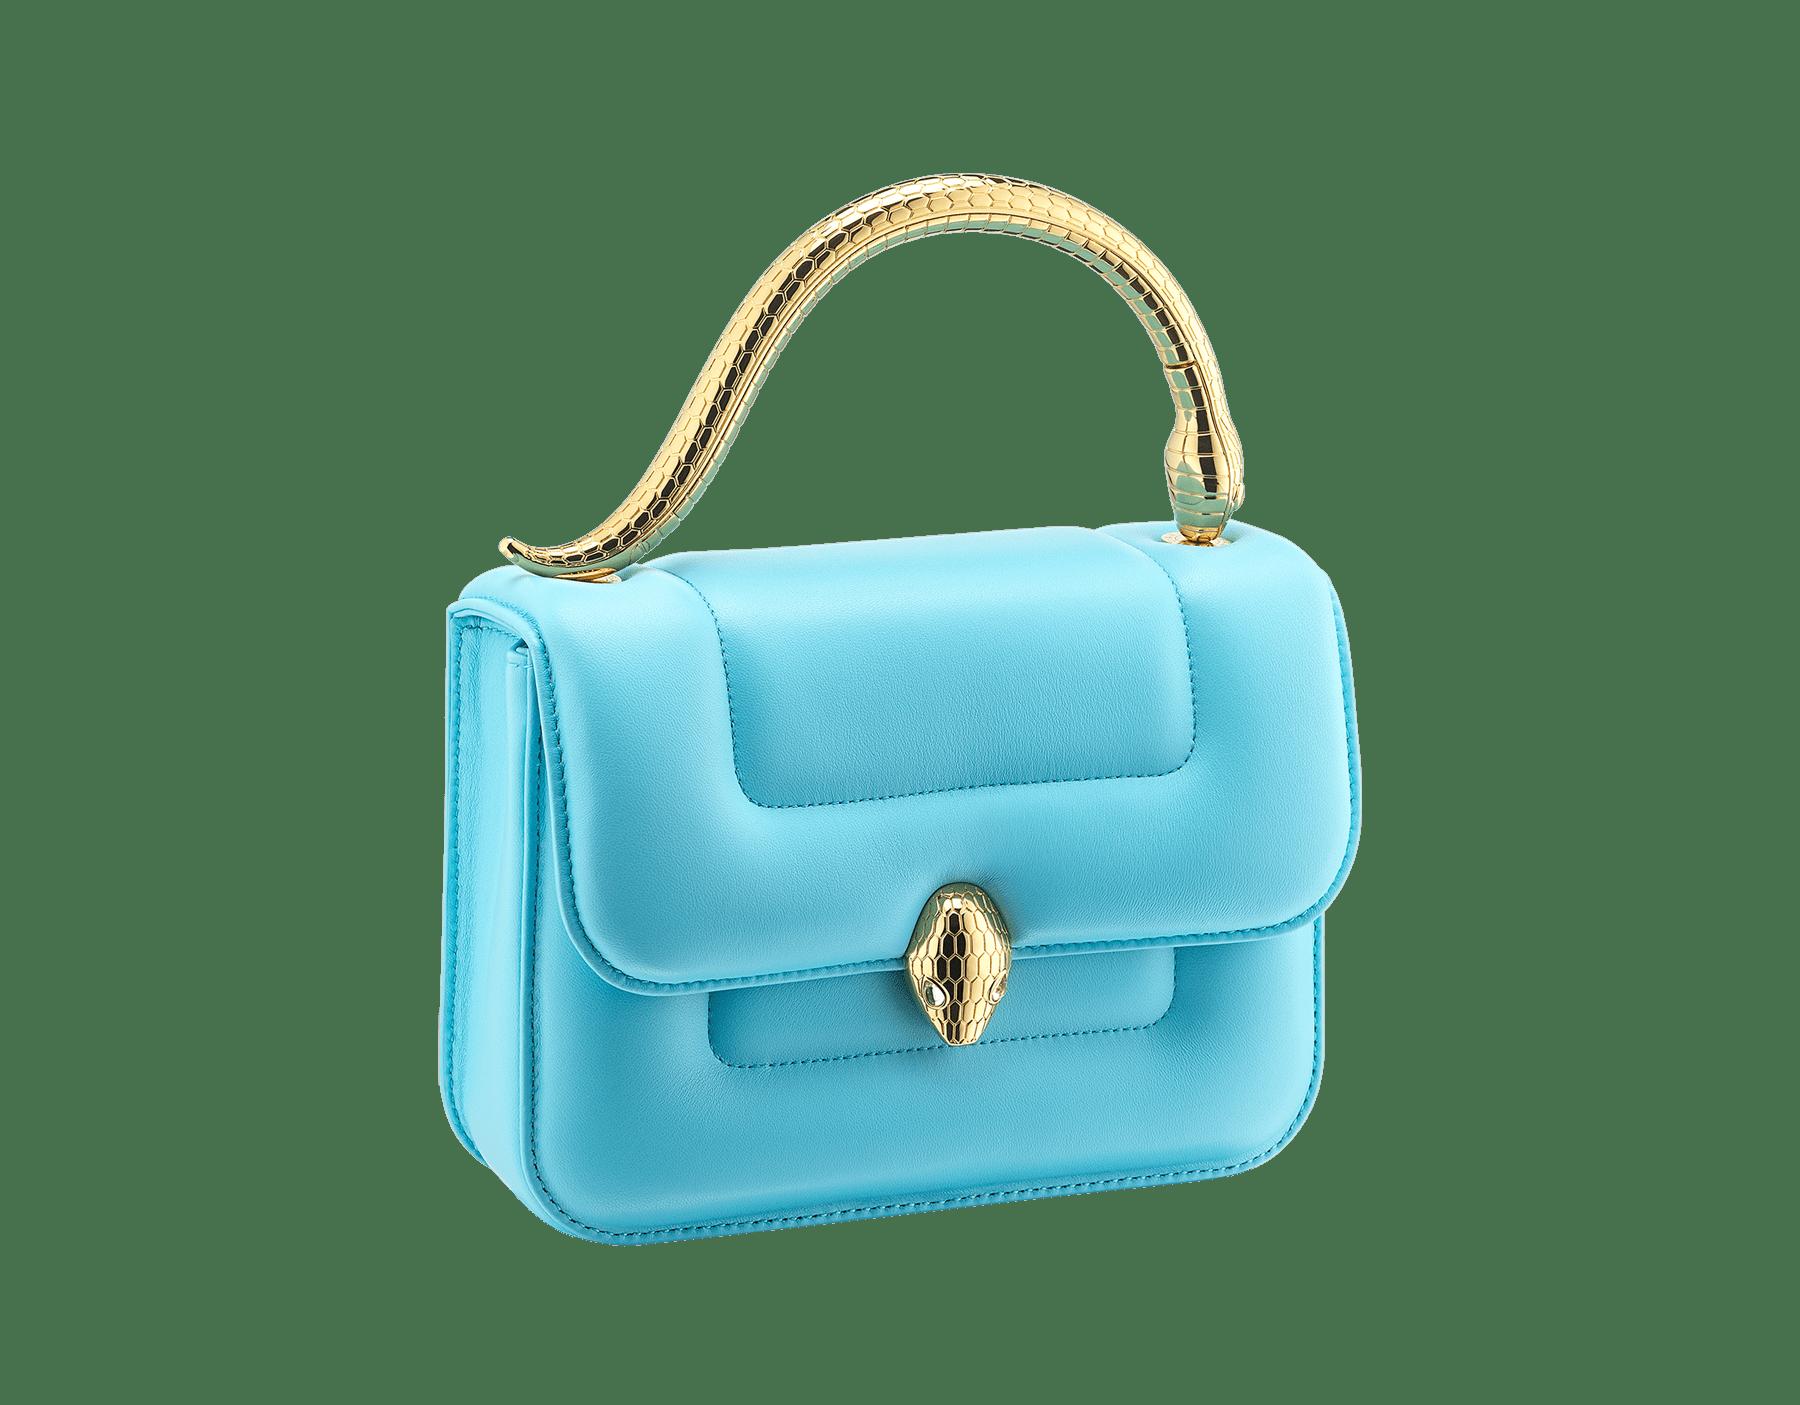 Mary Katrantzou x Bvlgari 手提包,採用柔軟的 Aegean Toapz 藍色絎縫納帕軟面皮,Aegean Toapz 藍色納帕軟面皮襯裡。新式金色黃銅 Serpenti 蛇頭扣環,誘人蛇眼鑲飾水晶。特別版包款。 MK-1142 image 2